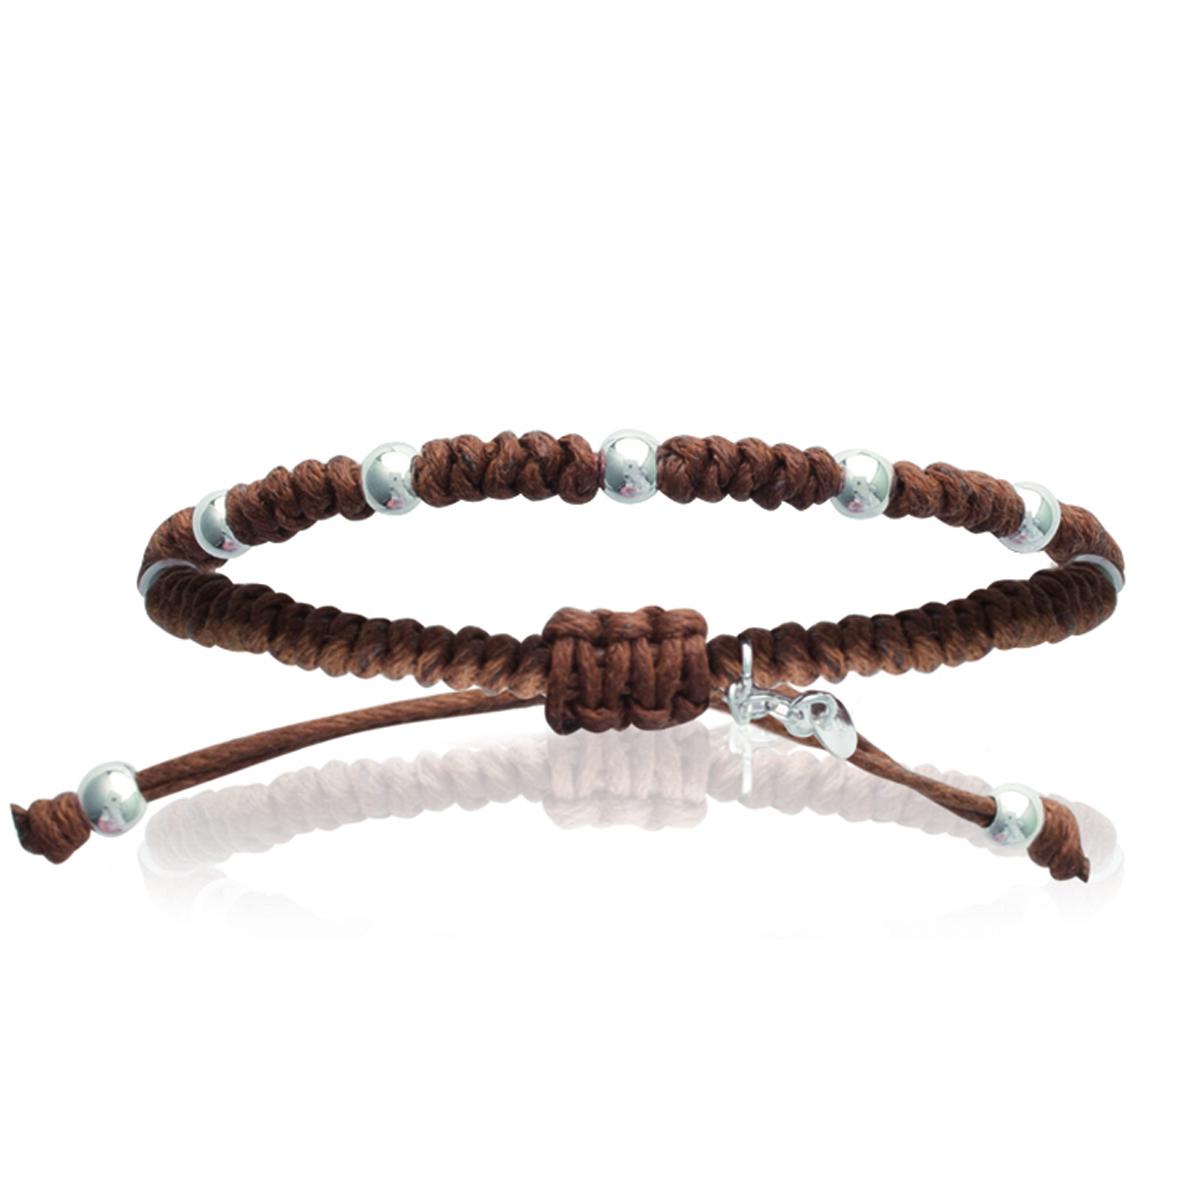 Bracelet Argent shambhala \'Billes\' marron camel - 4 mm - [I8065]